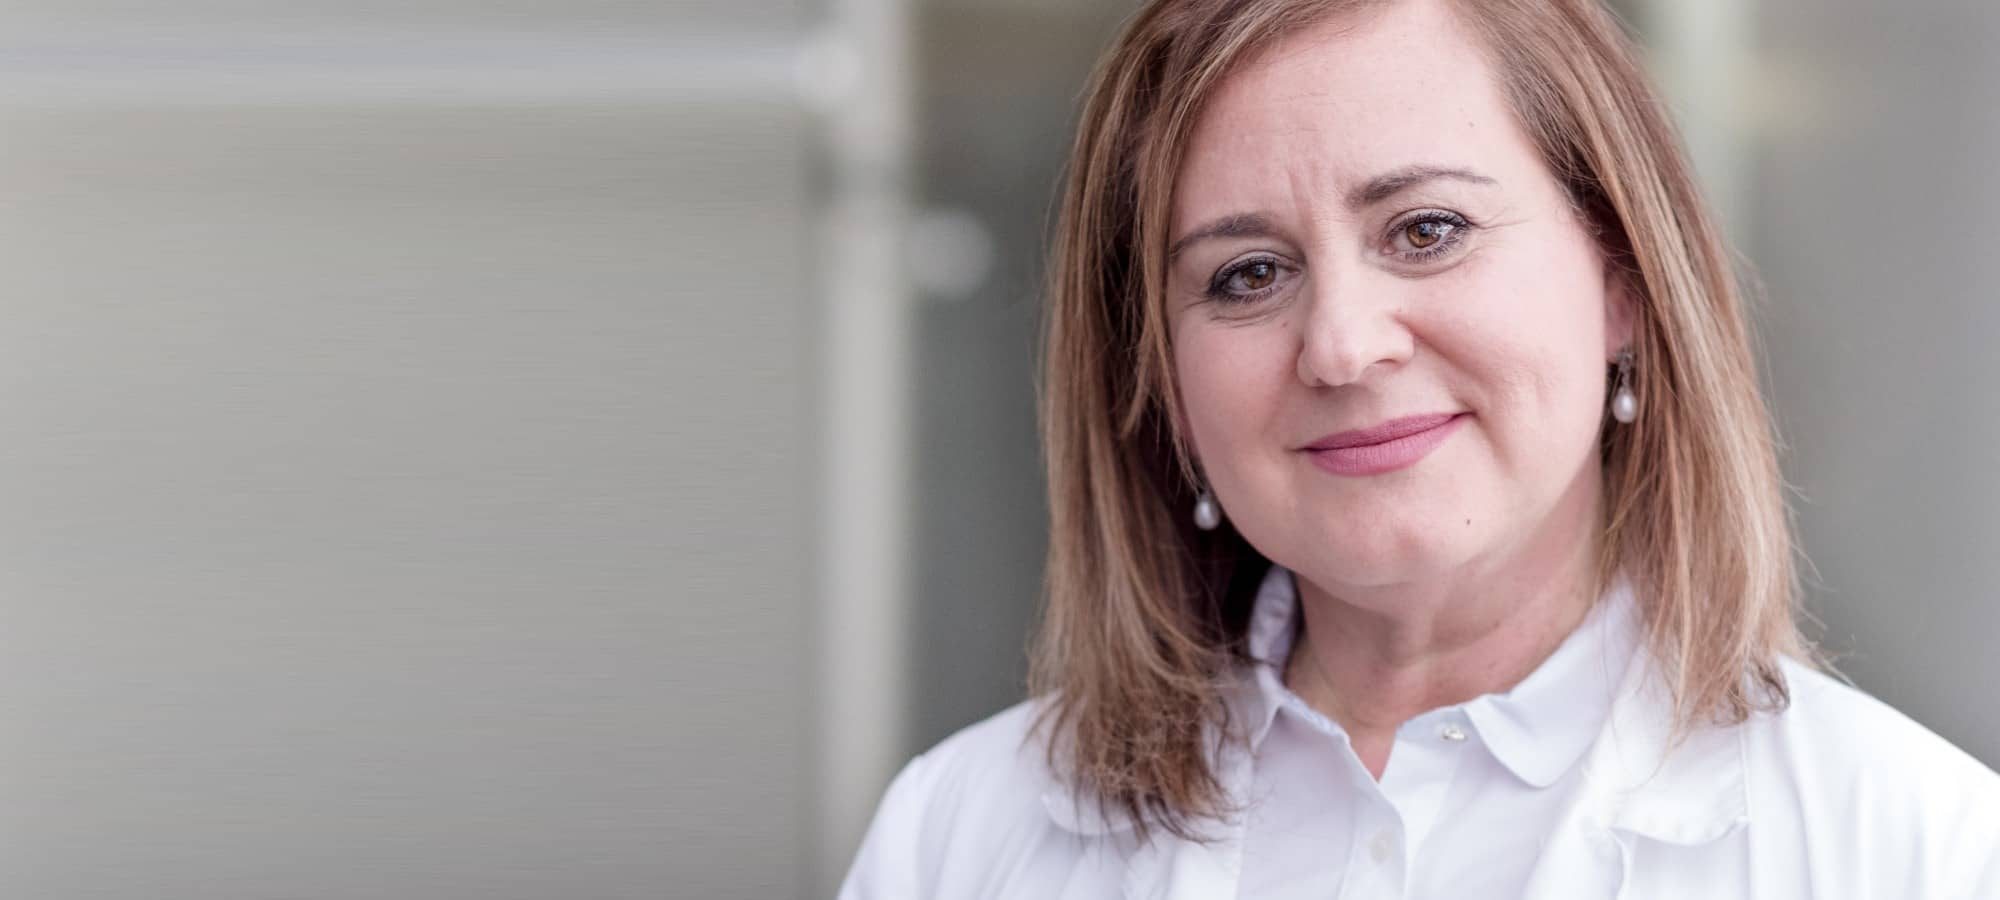 Zahnärztin Silvia Cukier de Horwitz | groisman & laube